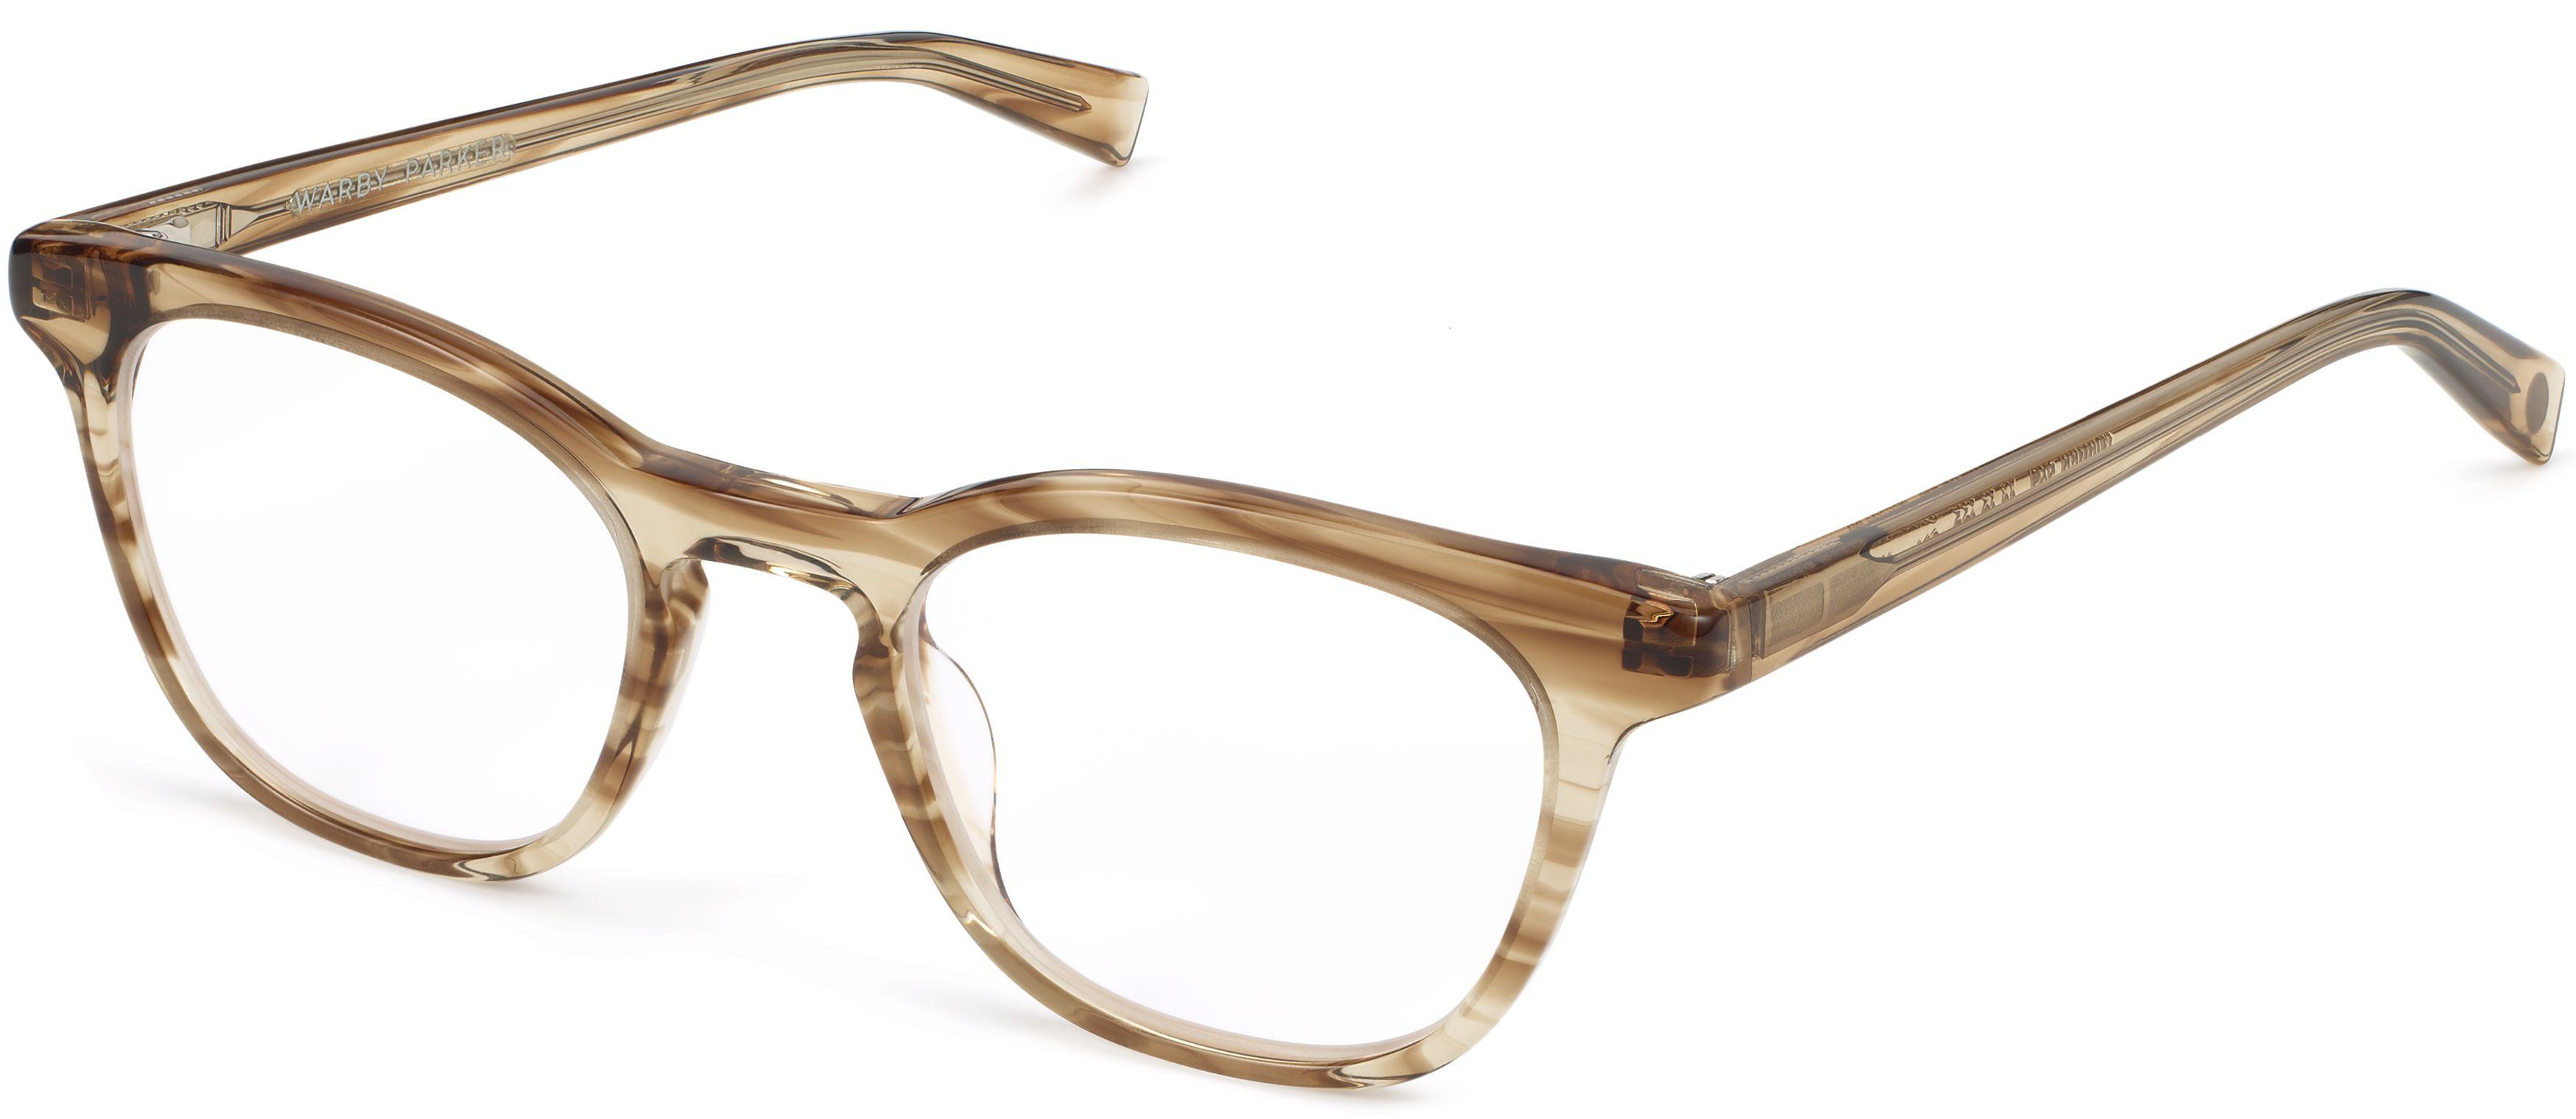 3c2056e8a8 Turner Eyeglasses in Chestnut Crystal for Men